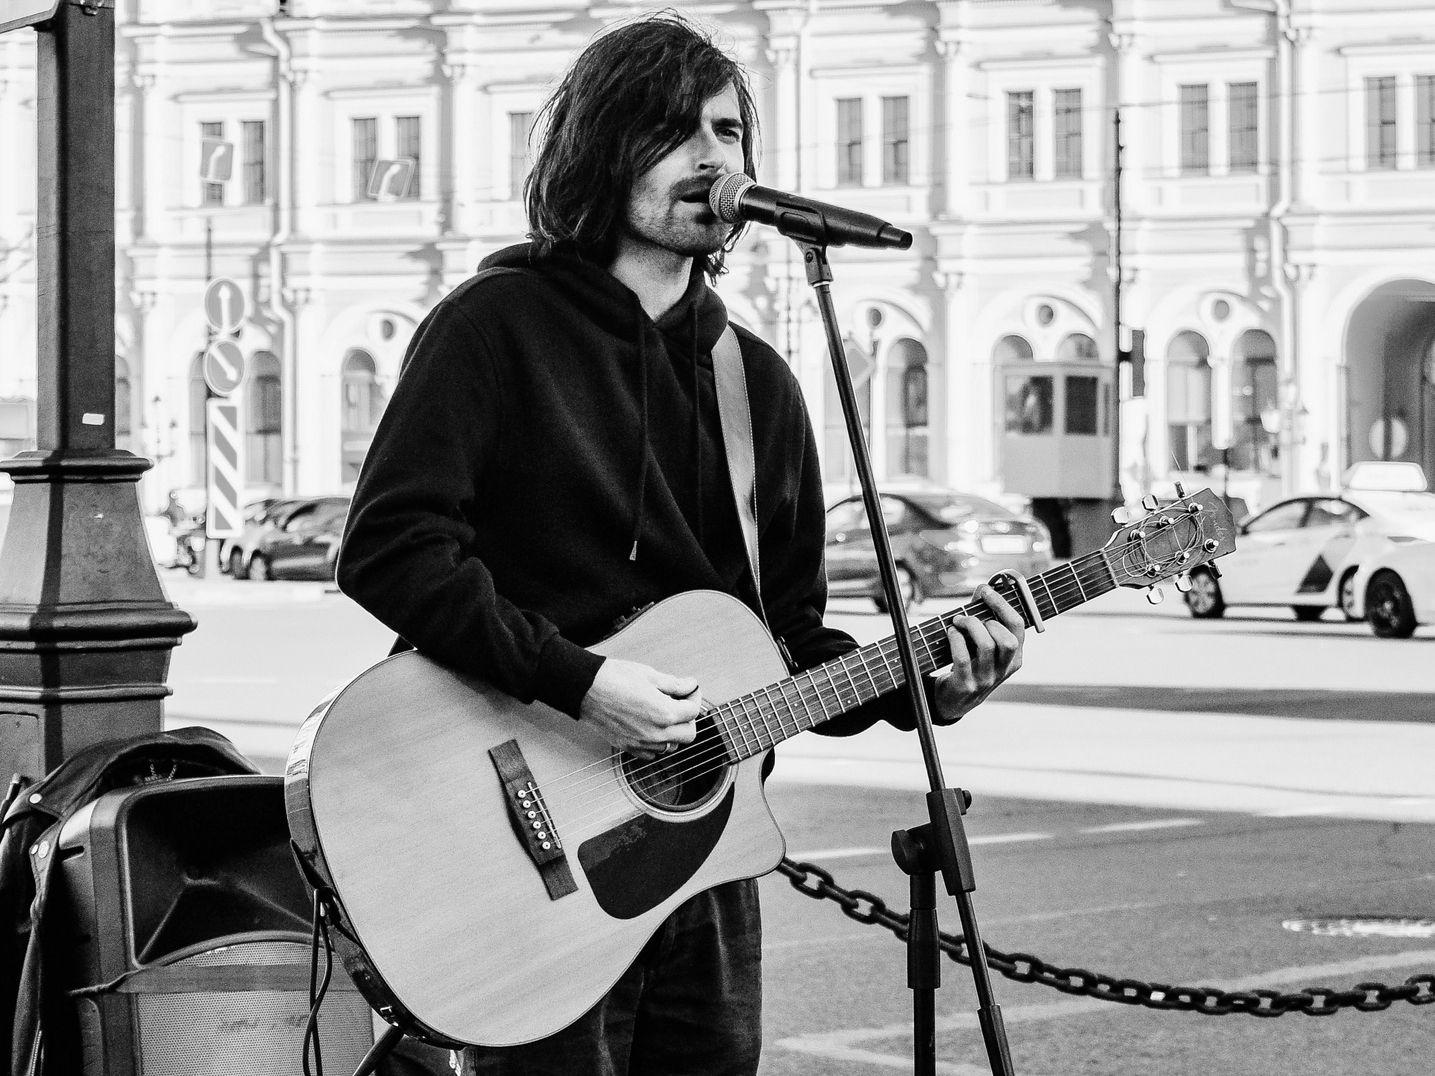 Иван Черепанов. Фото: Виктория Белая/ISTREETBAND VK